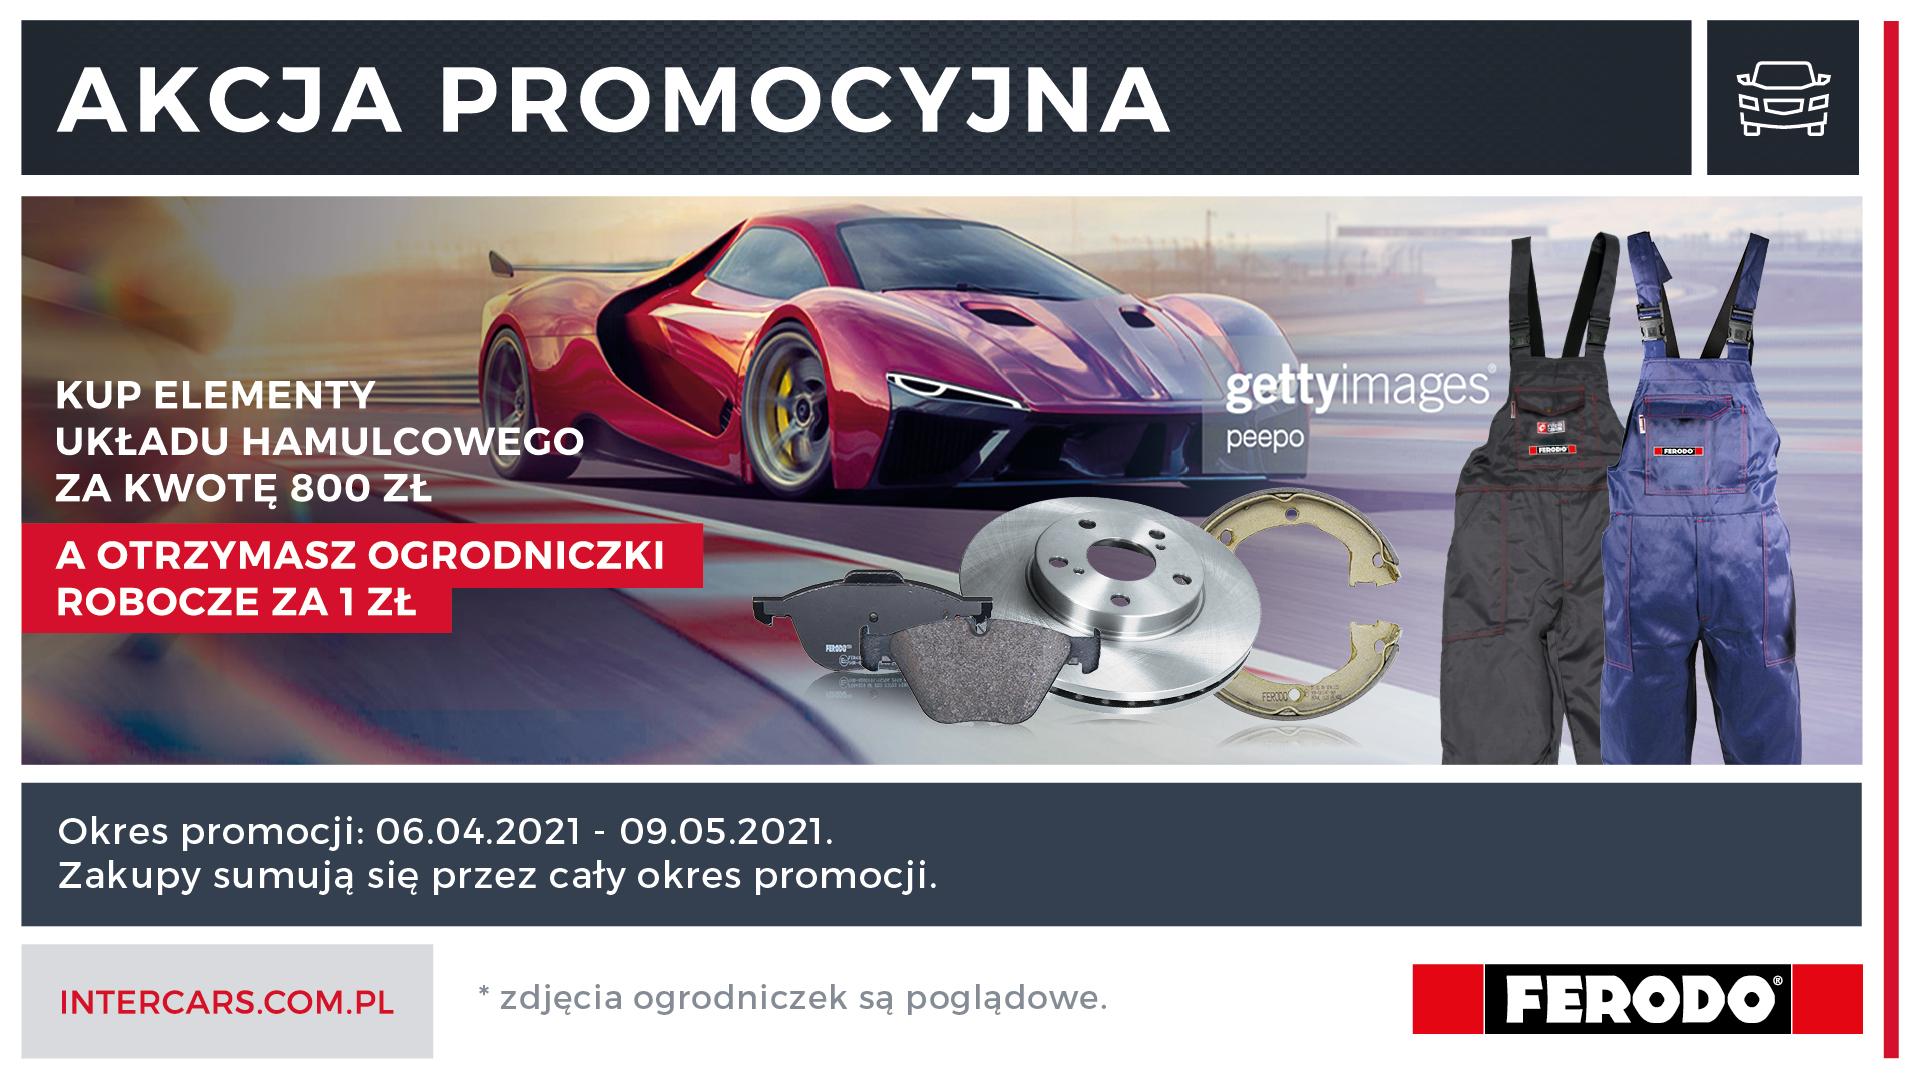 promocja_ferodo_kup_elementy_ukladu_hamulcowego_ogrodniczki_za1zl_1920x1080_katalog.jpg